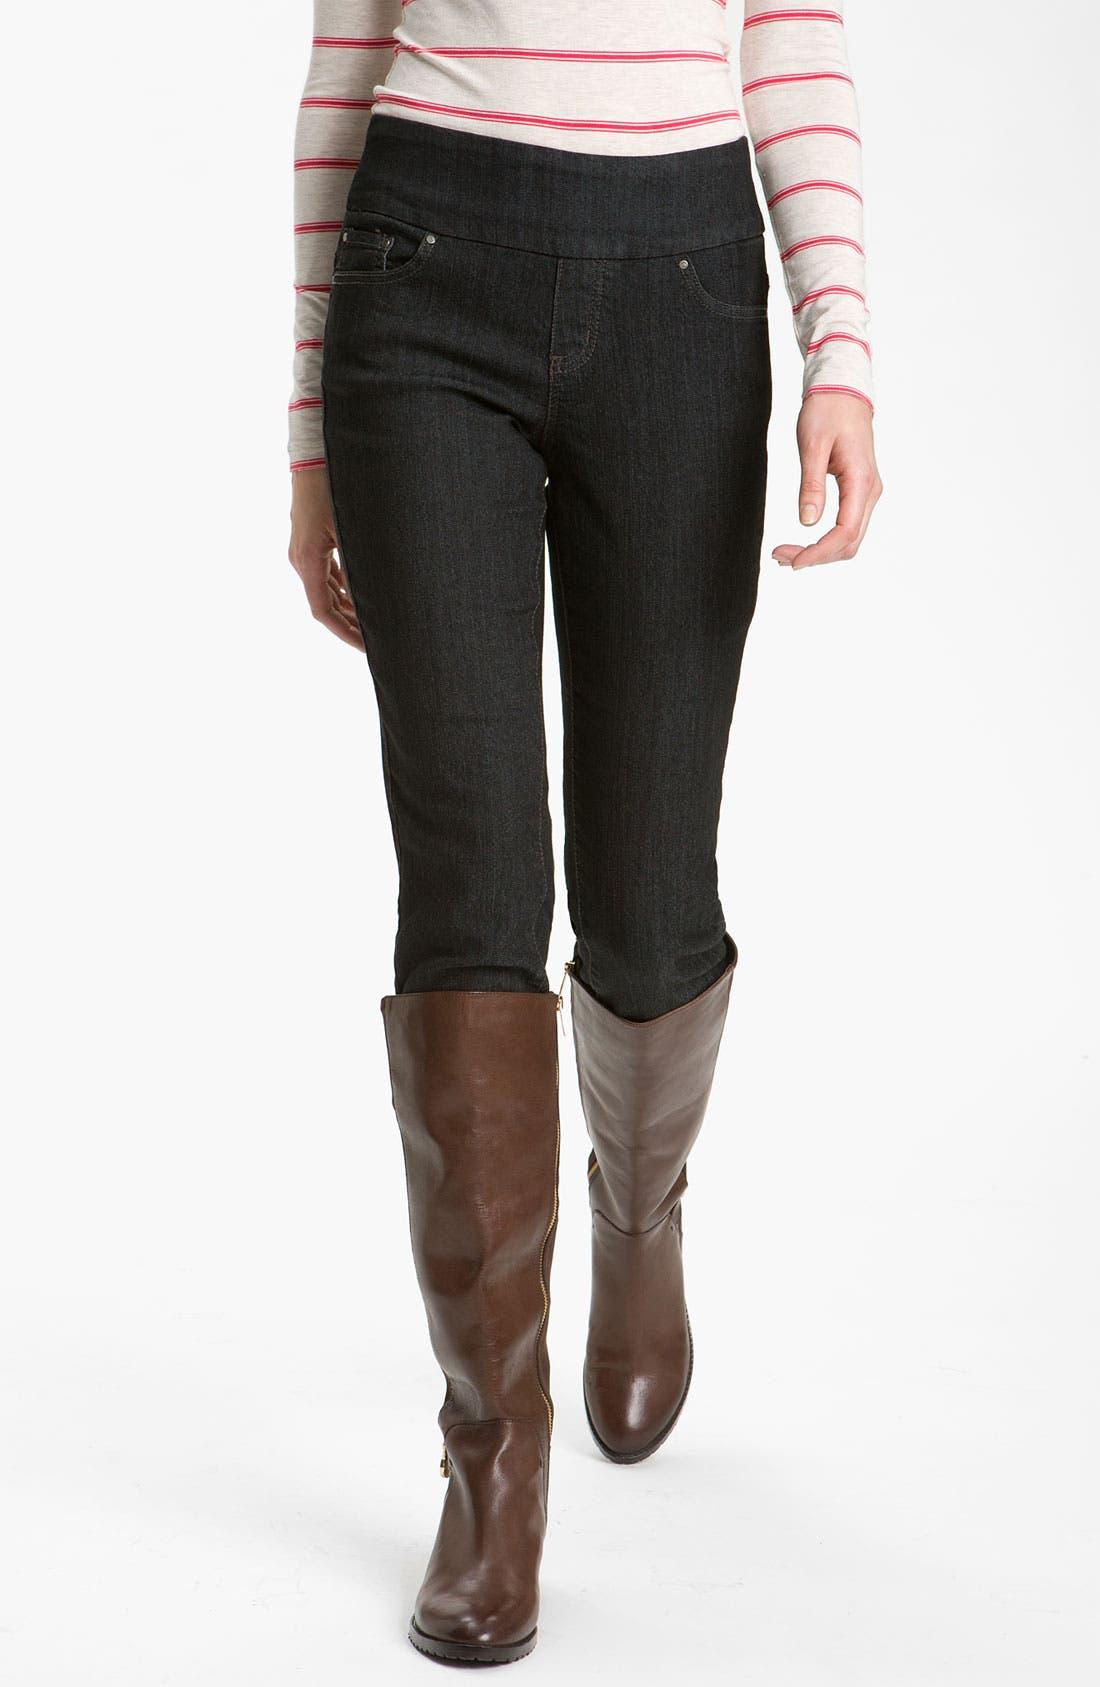 Main Image - Jag Jeans 'Malia' Slim Jeans (Black Rinse) (Online Exclusive)